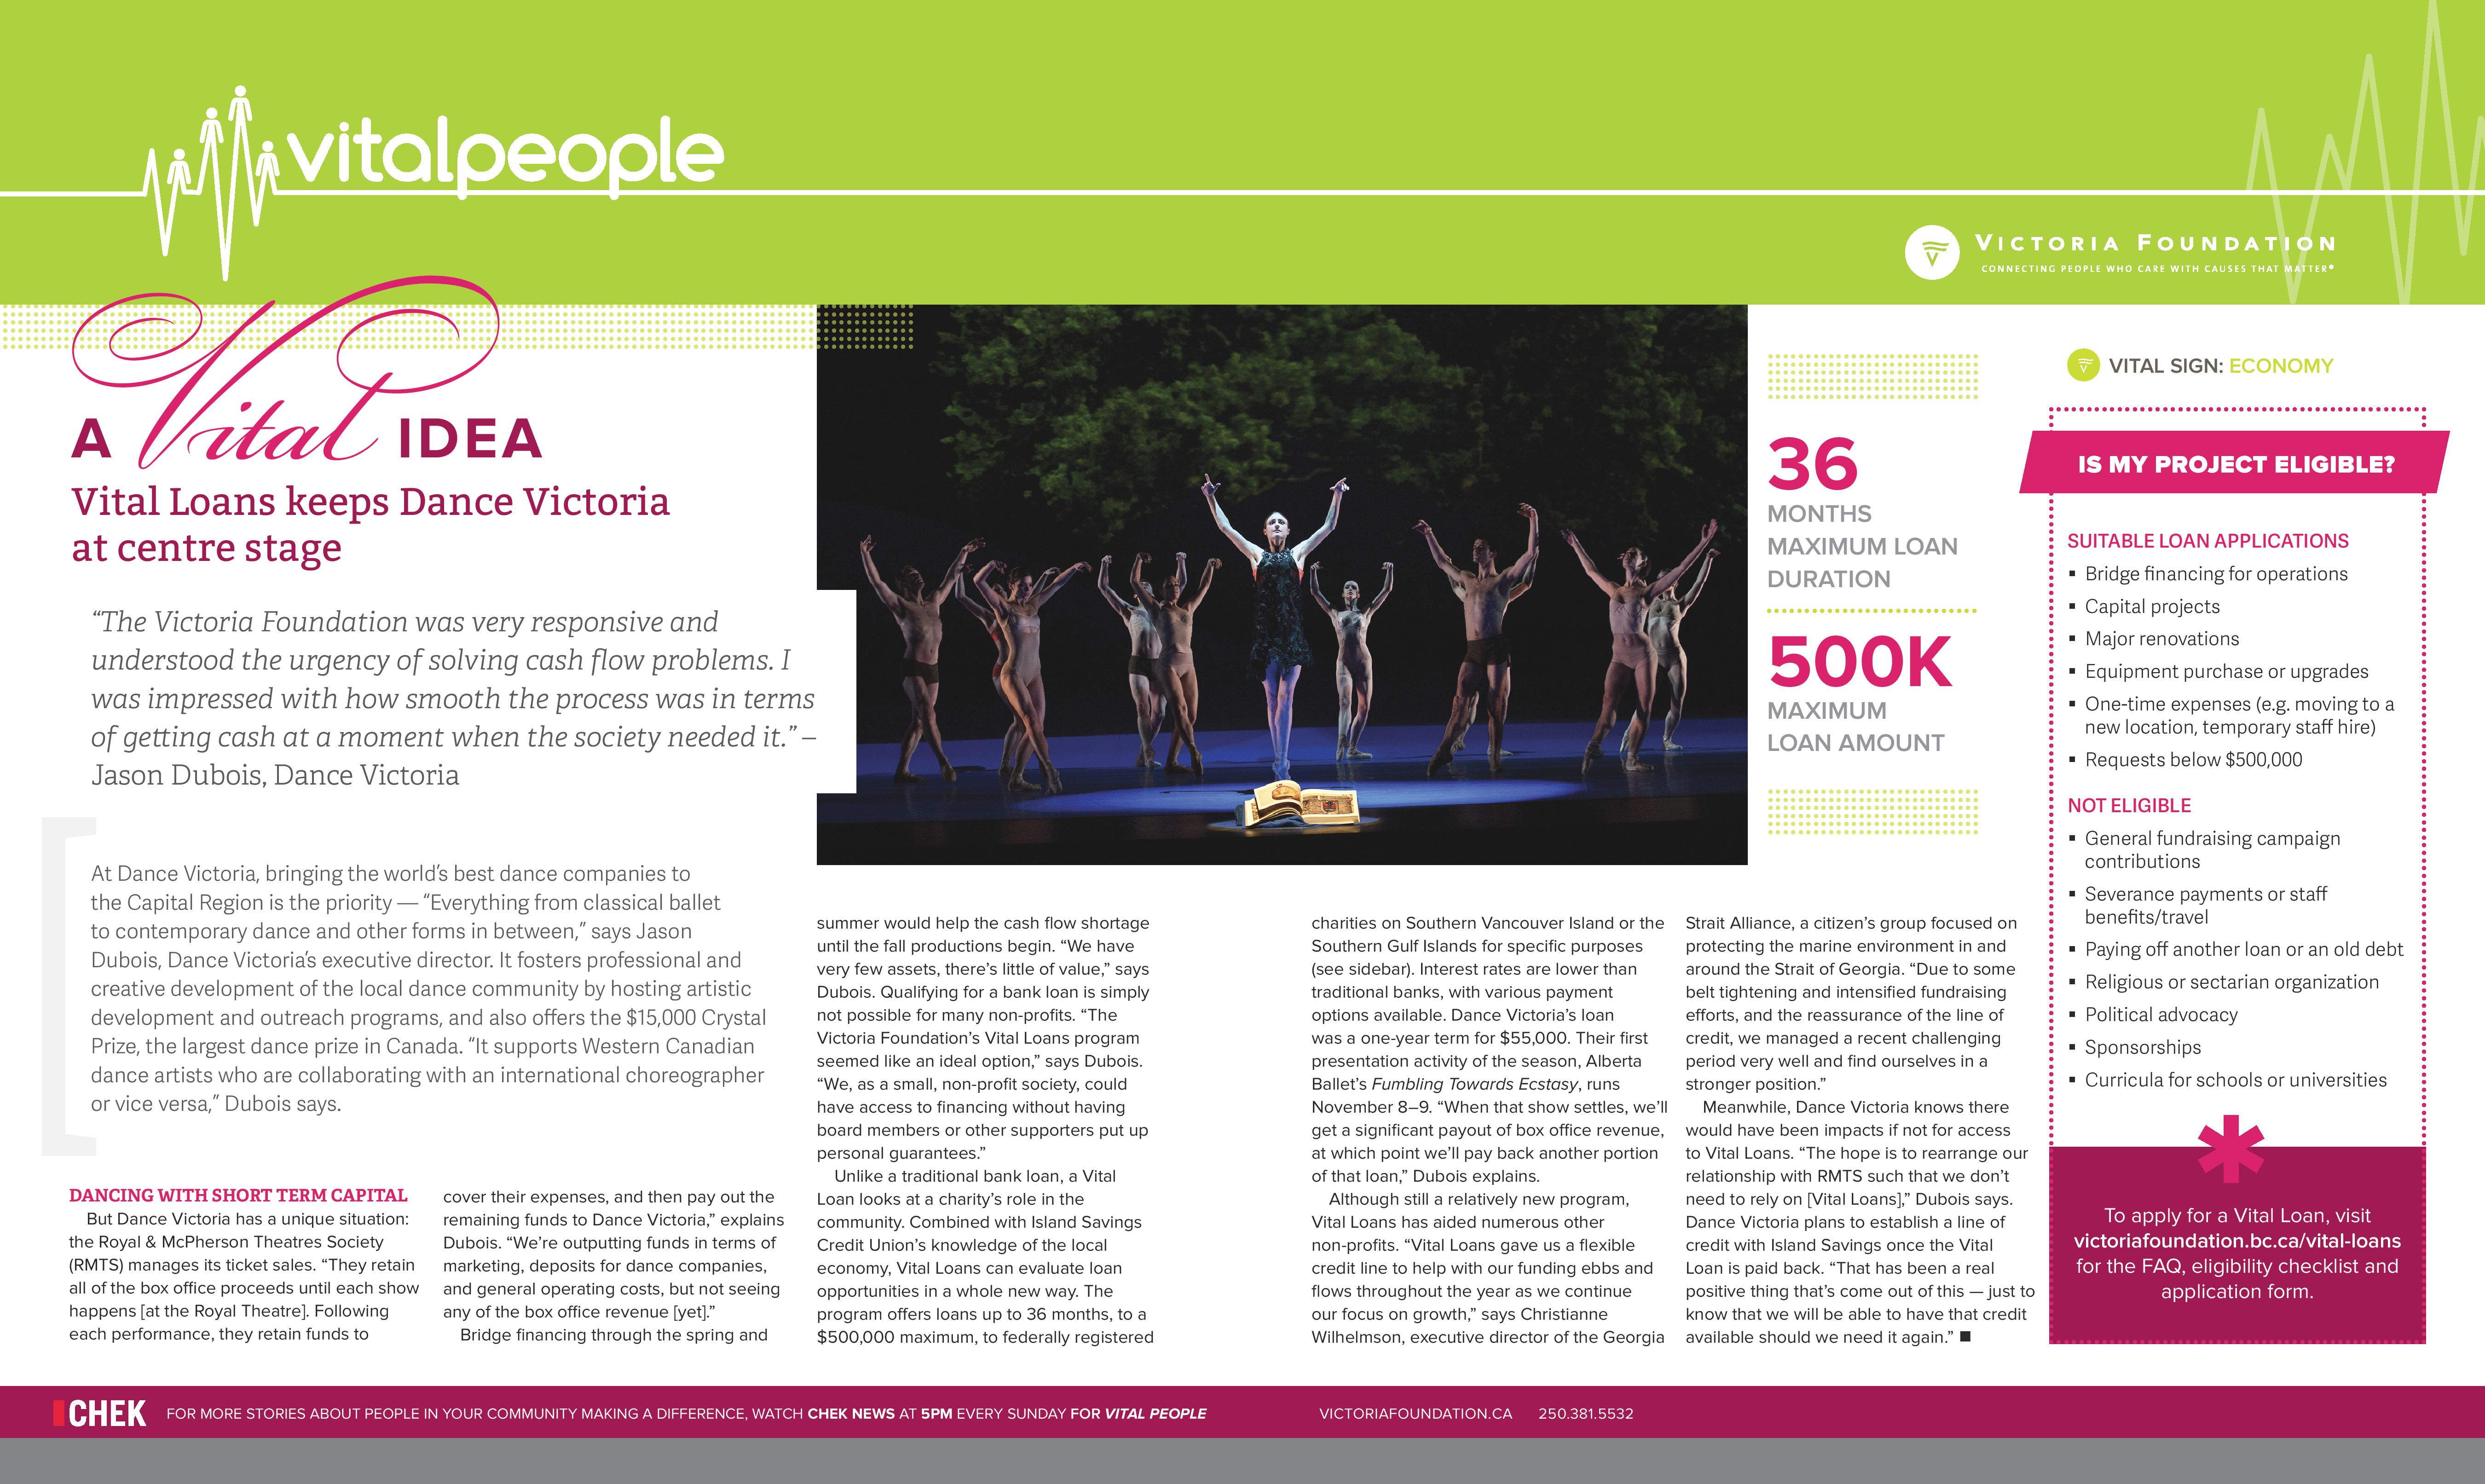 Vital People in Print: Dance Victoria and Vital Loans